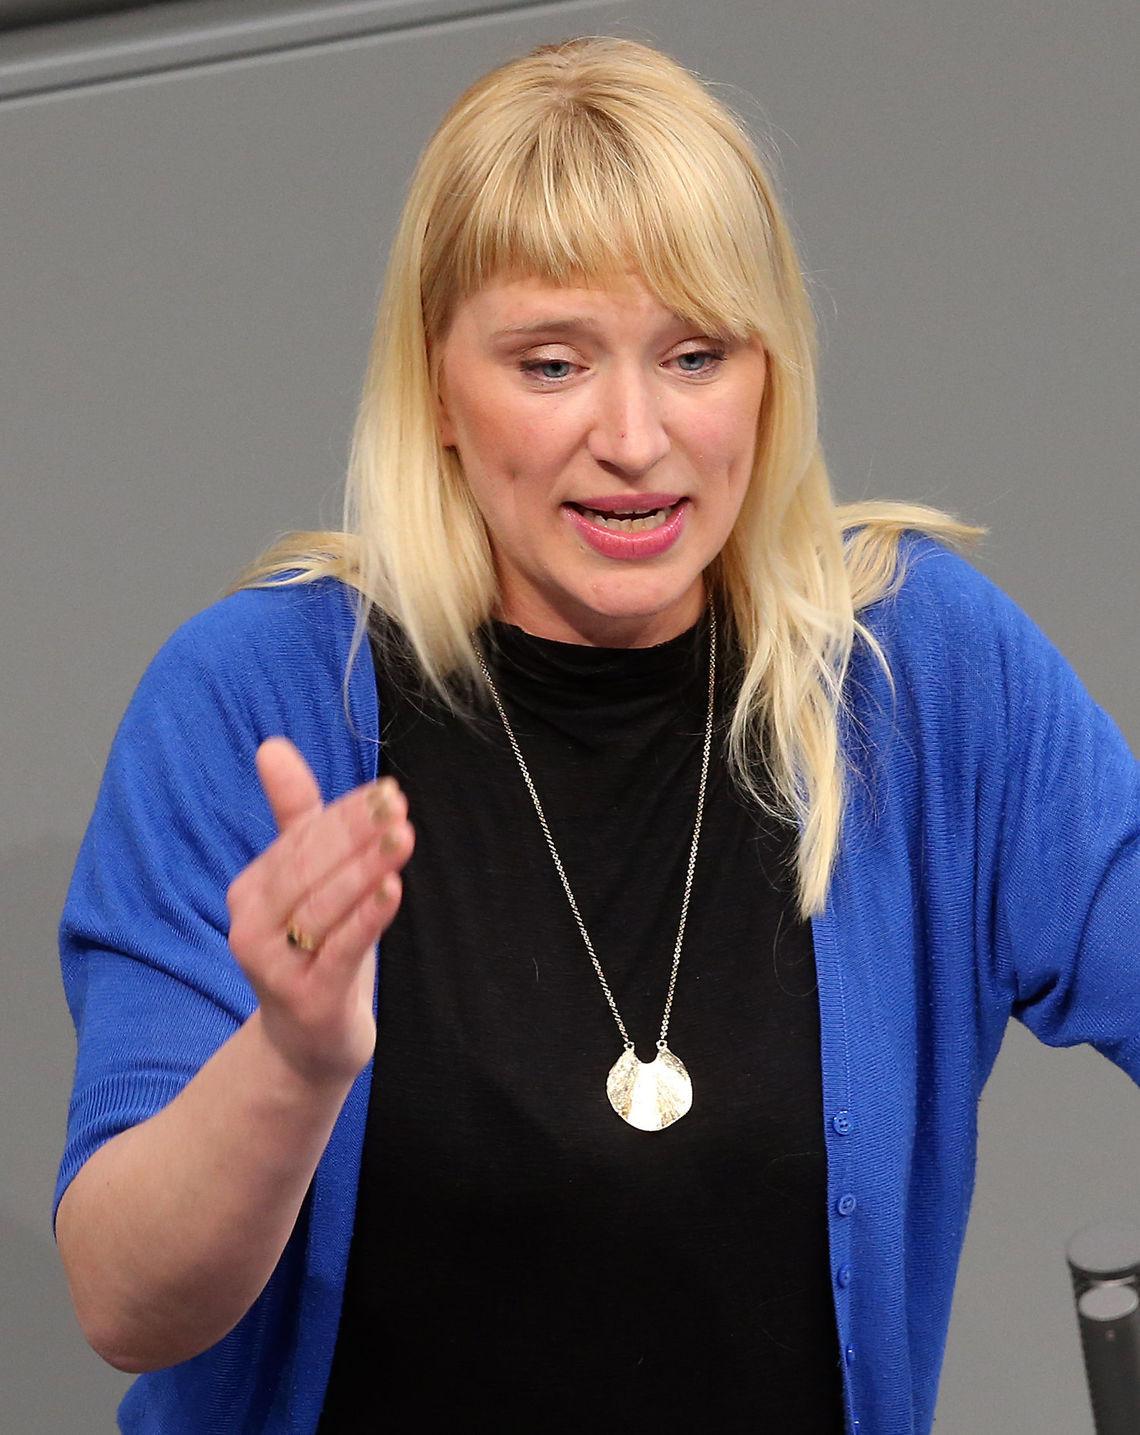 Grünen-Politikerin Luise Amtsberg zerlegt AfD-Antrag - Politik ...